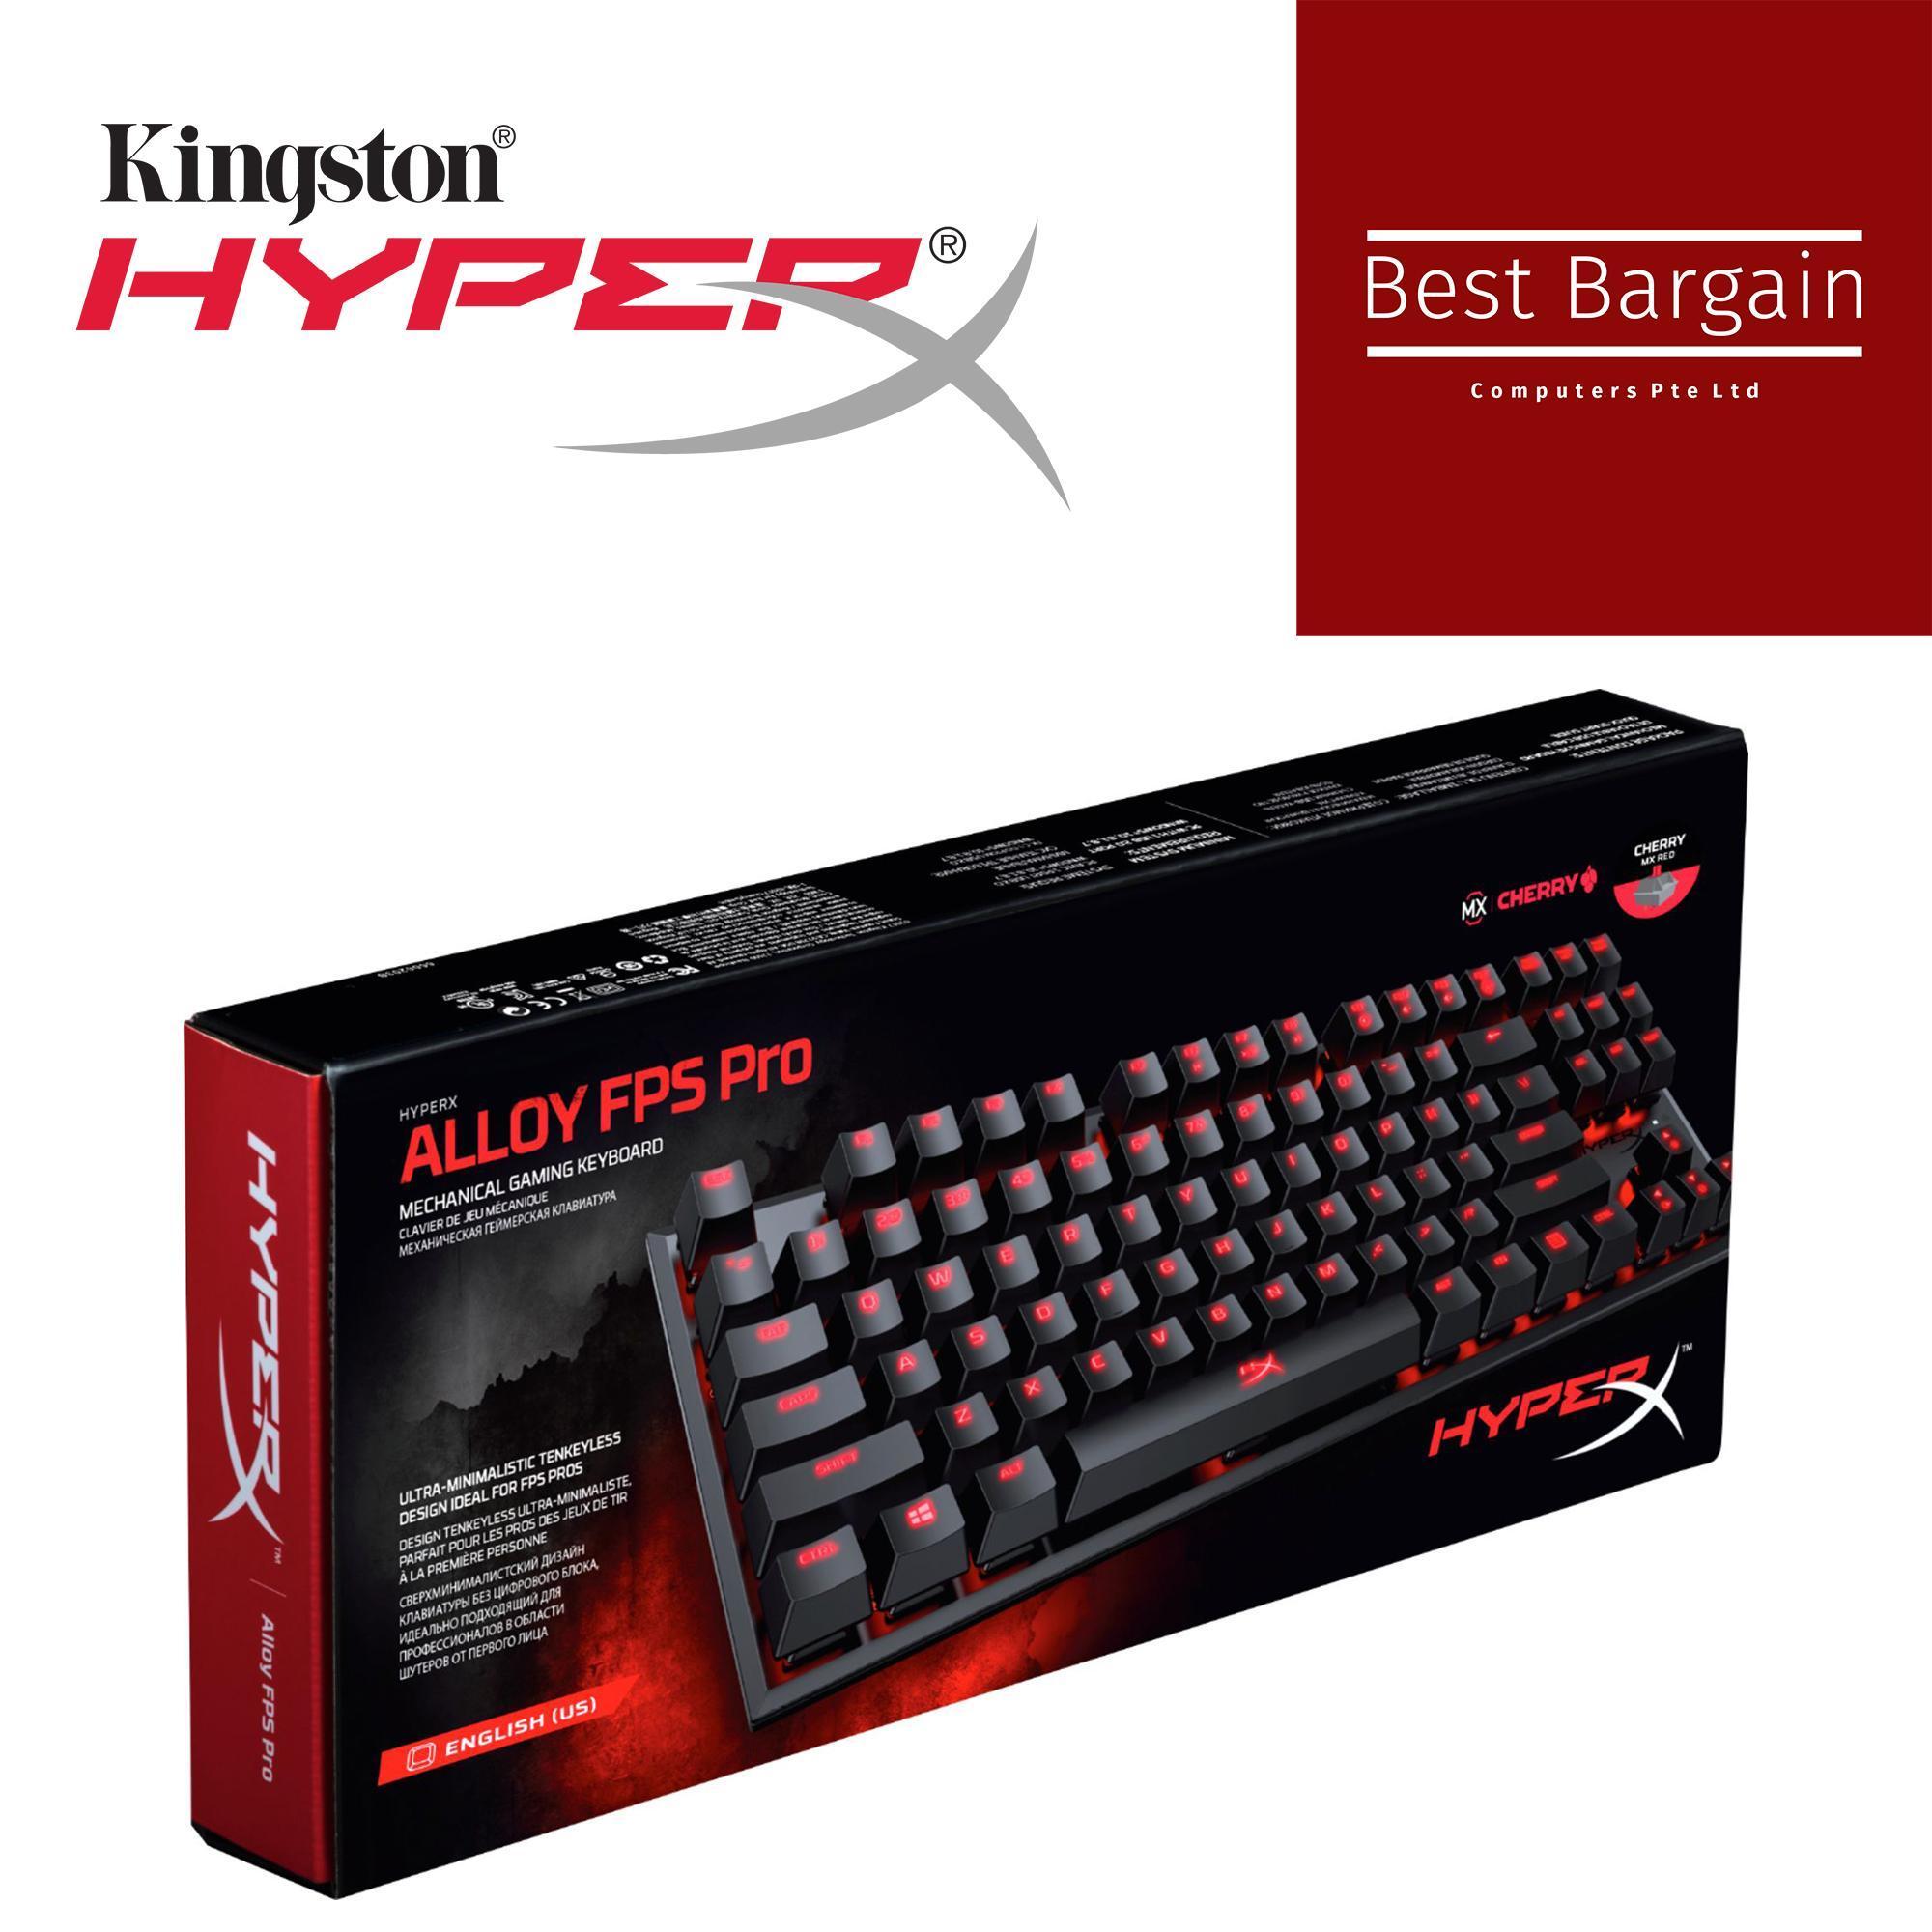 7de2935babc Latest HyperX Gaming Keyboards Products   Enjoy Huge Discounts ...